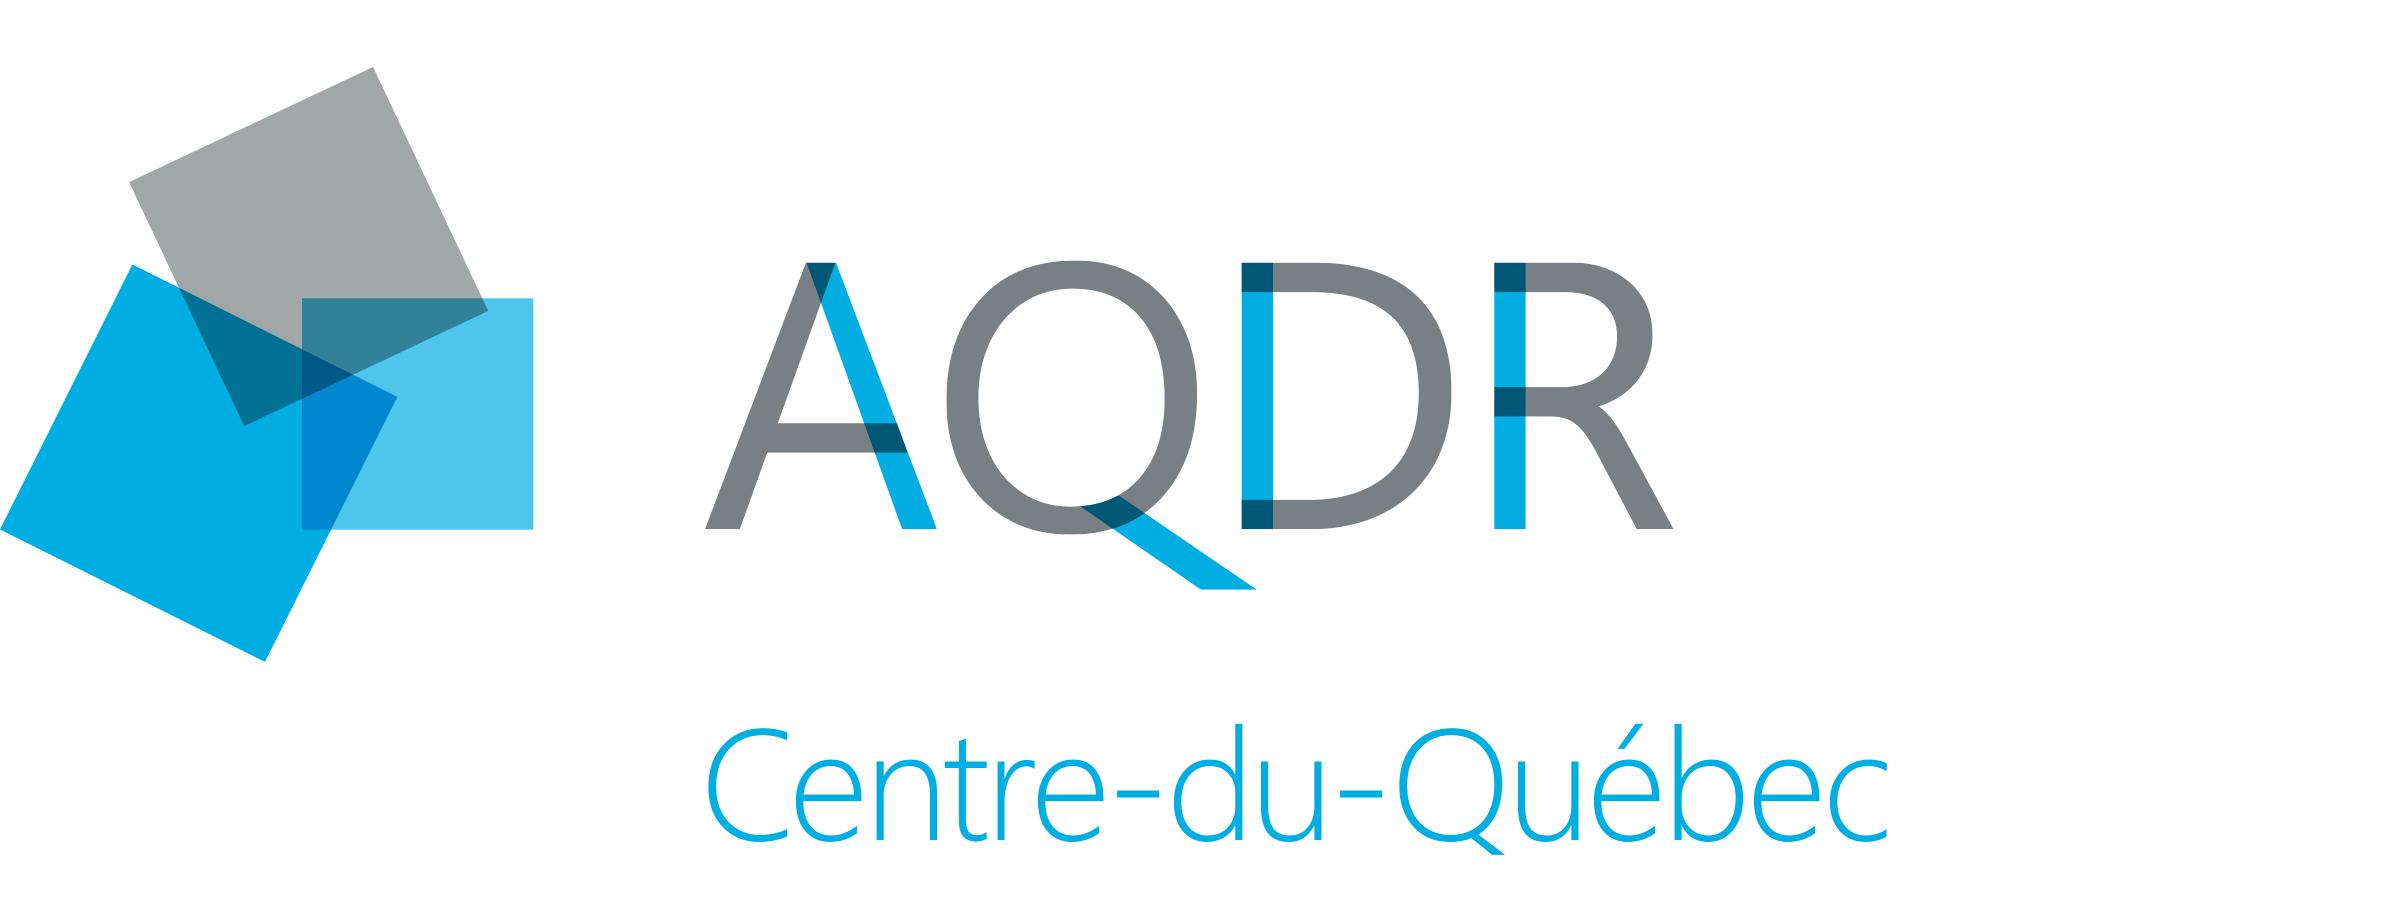 AQDR CdQ